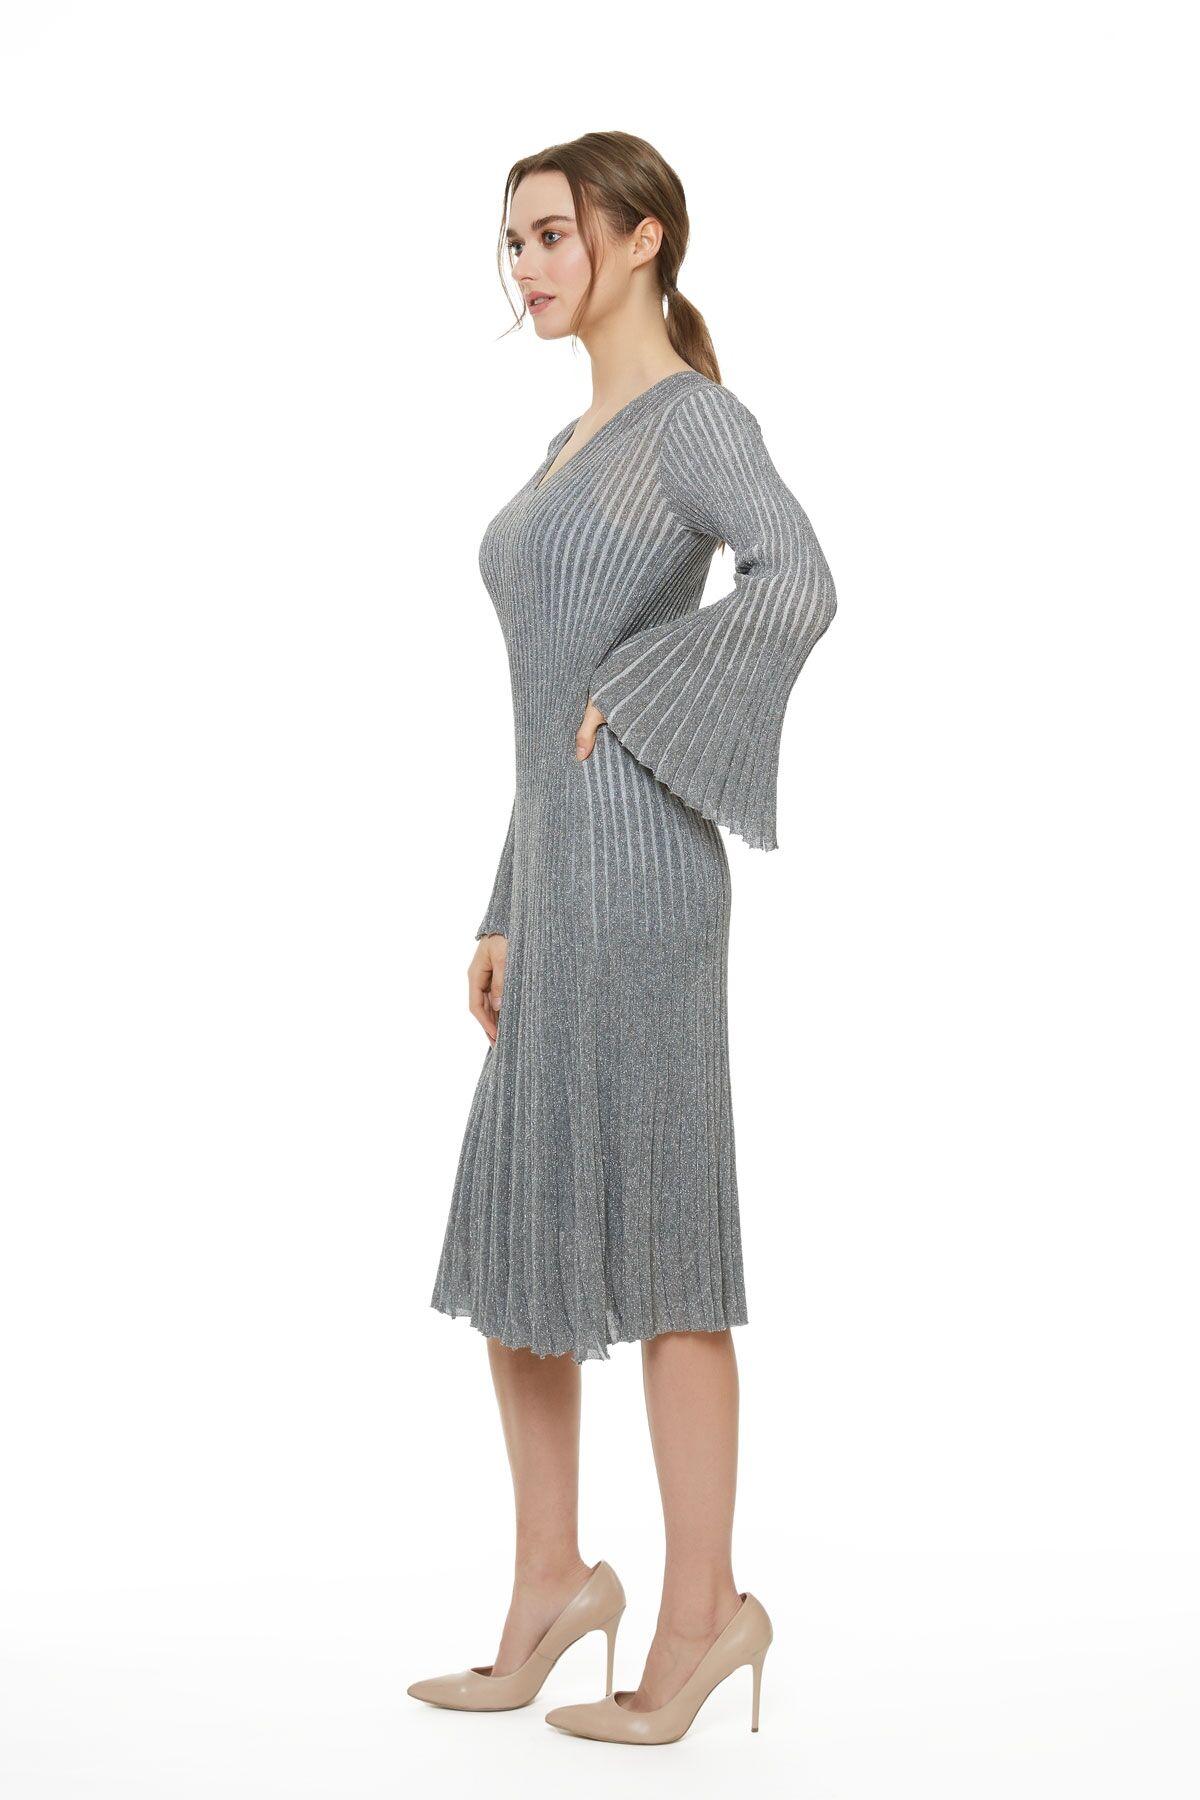 Metalik Çizgili Triko Gri Çan Elbise